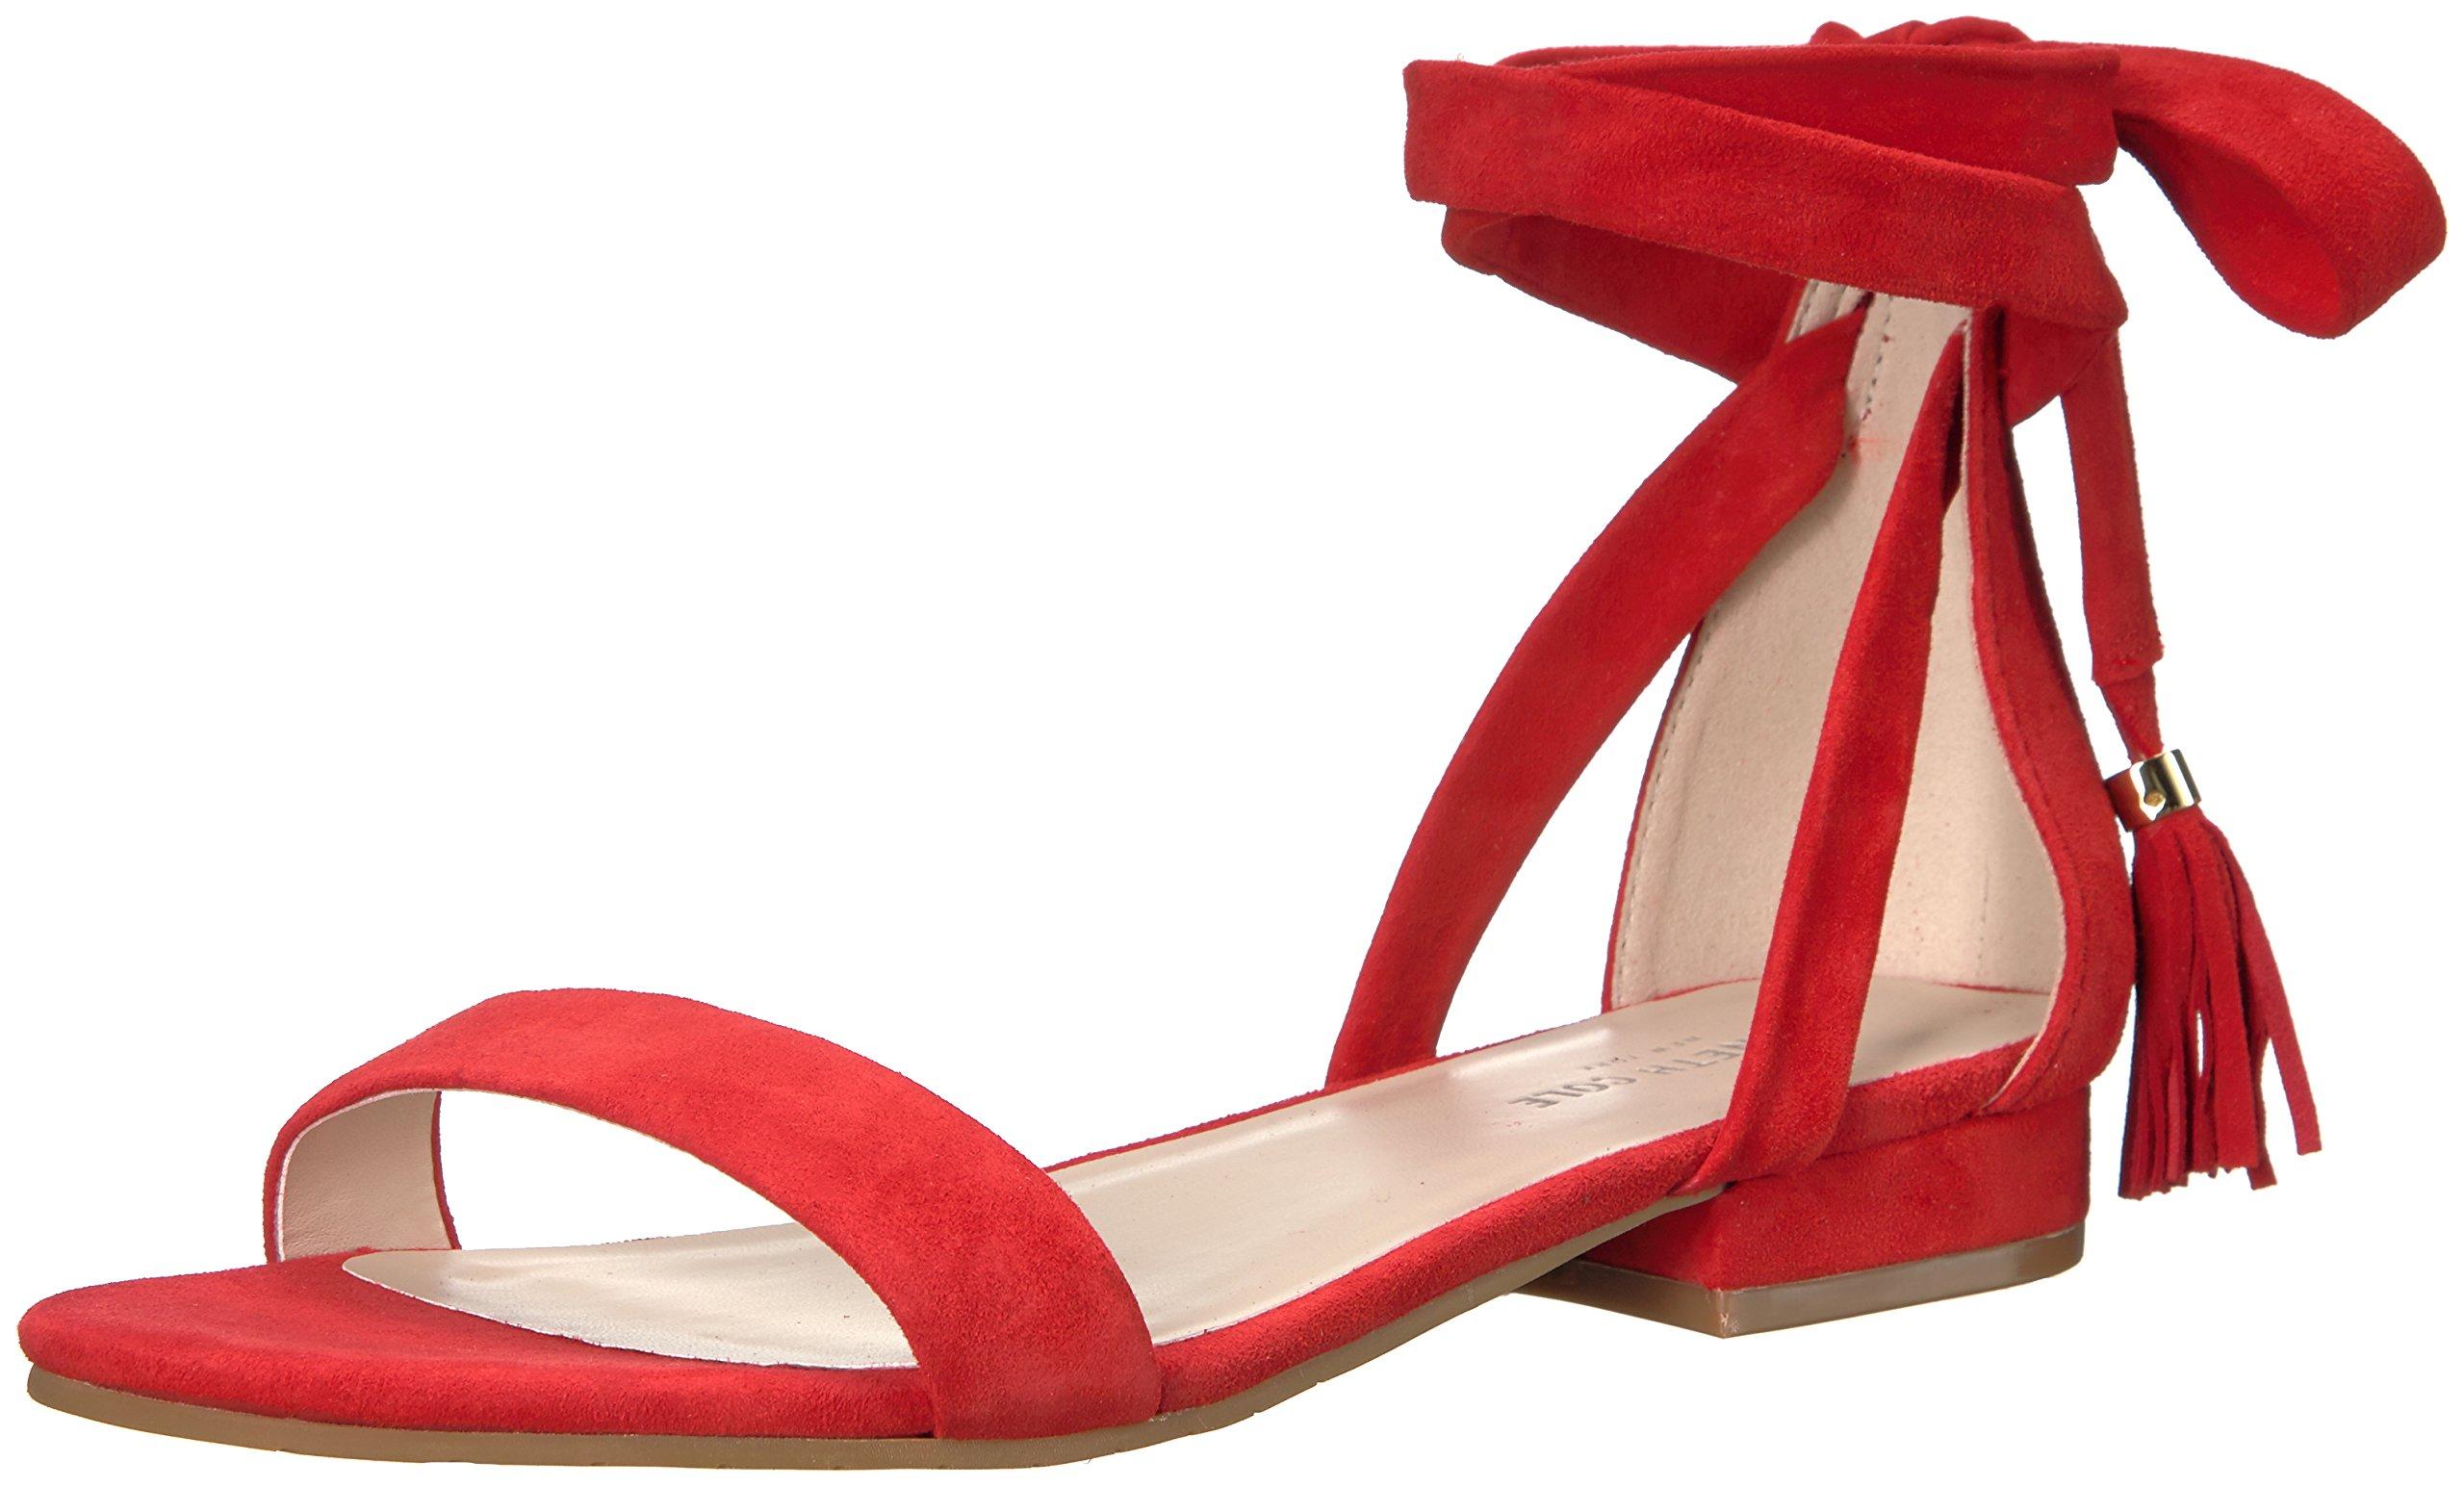 Kenneth Cole New York Women's Valen Gladiator Sandal, Red, 8.5 M US